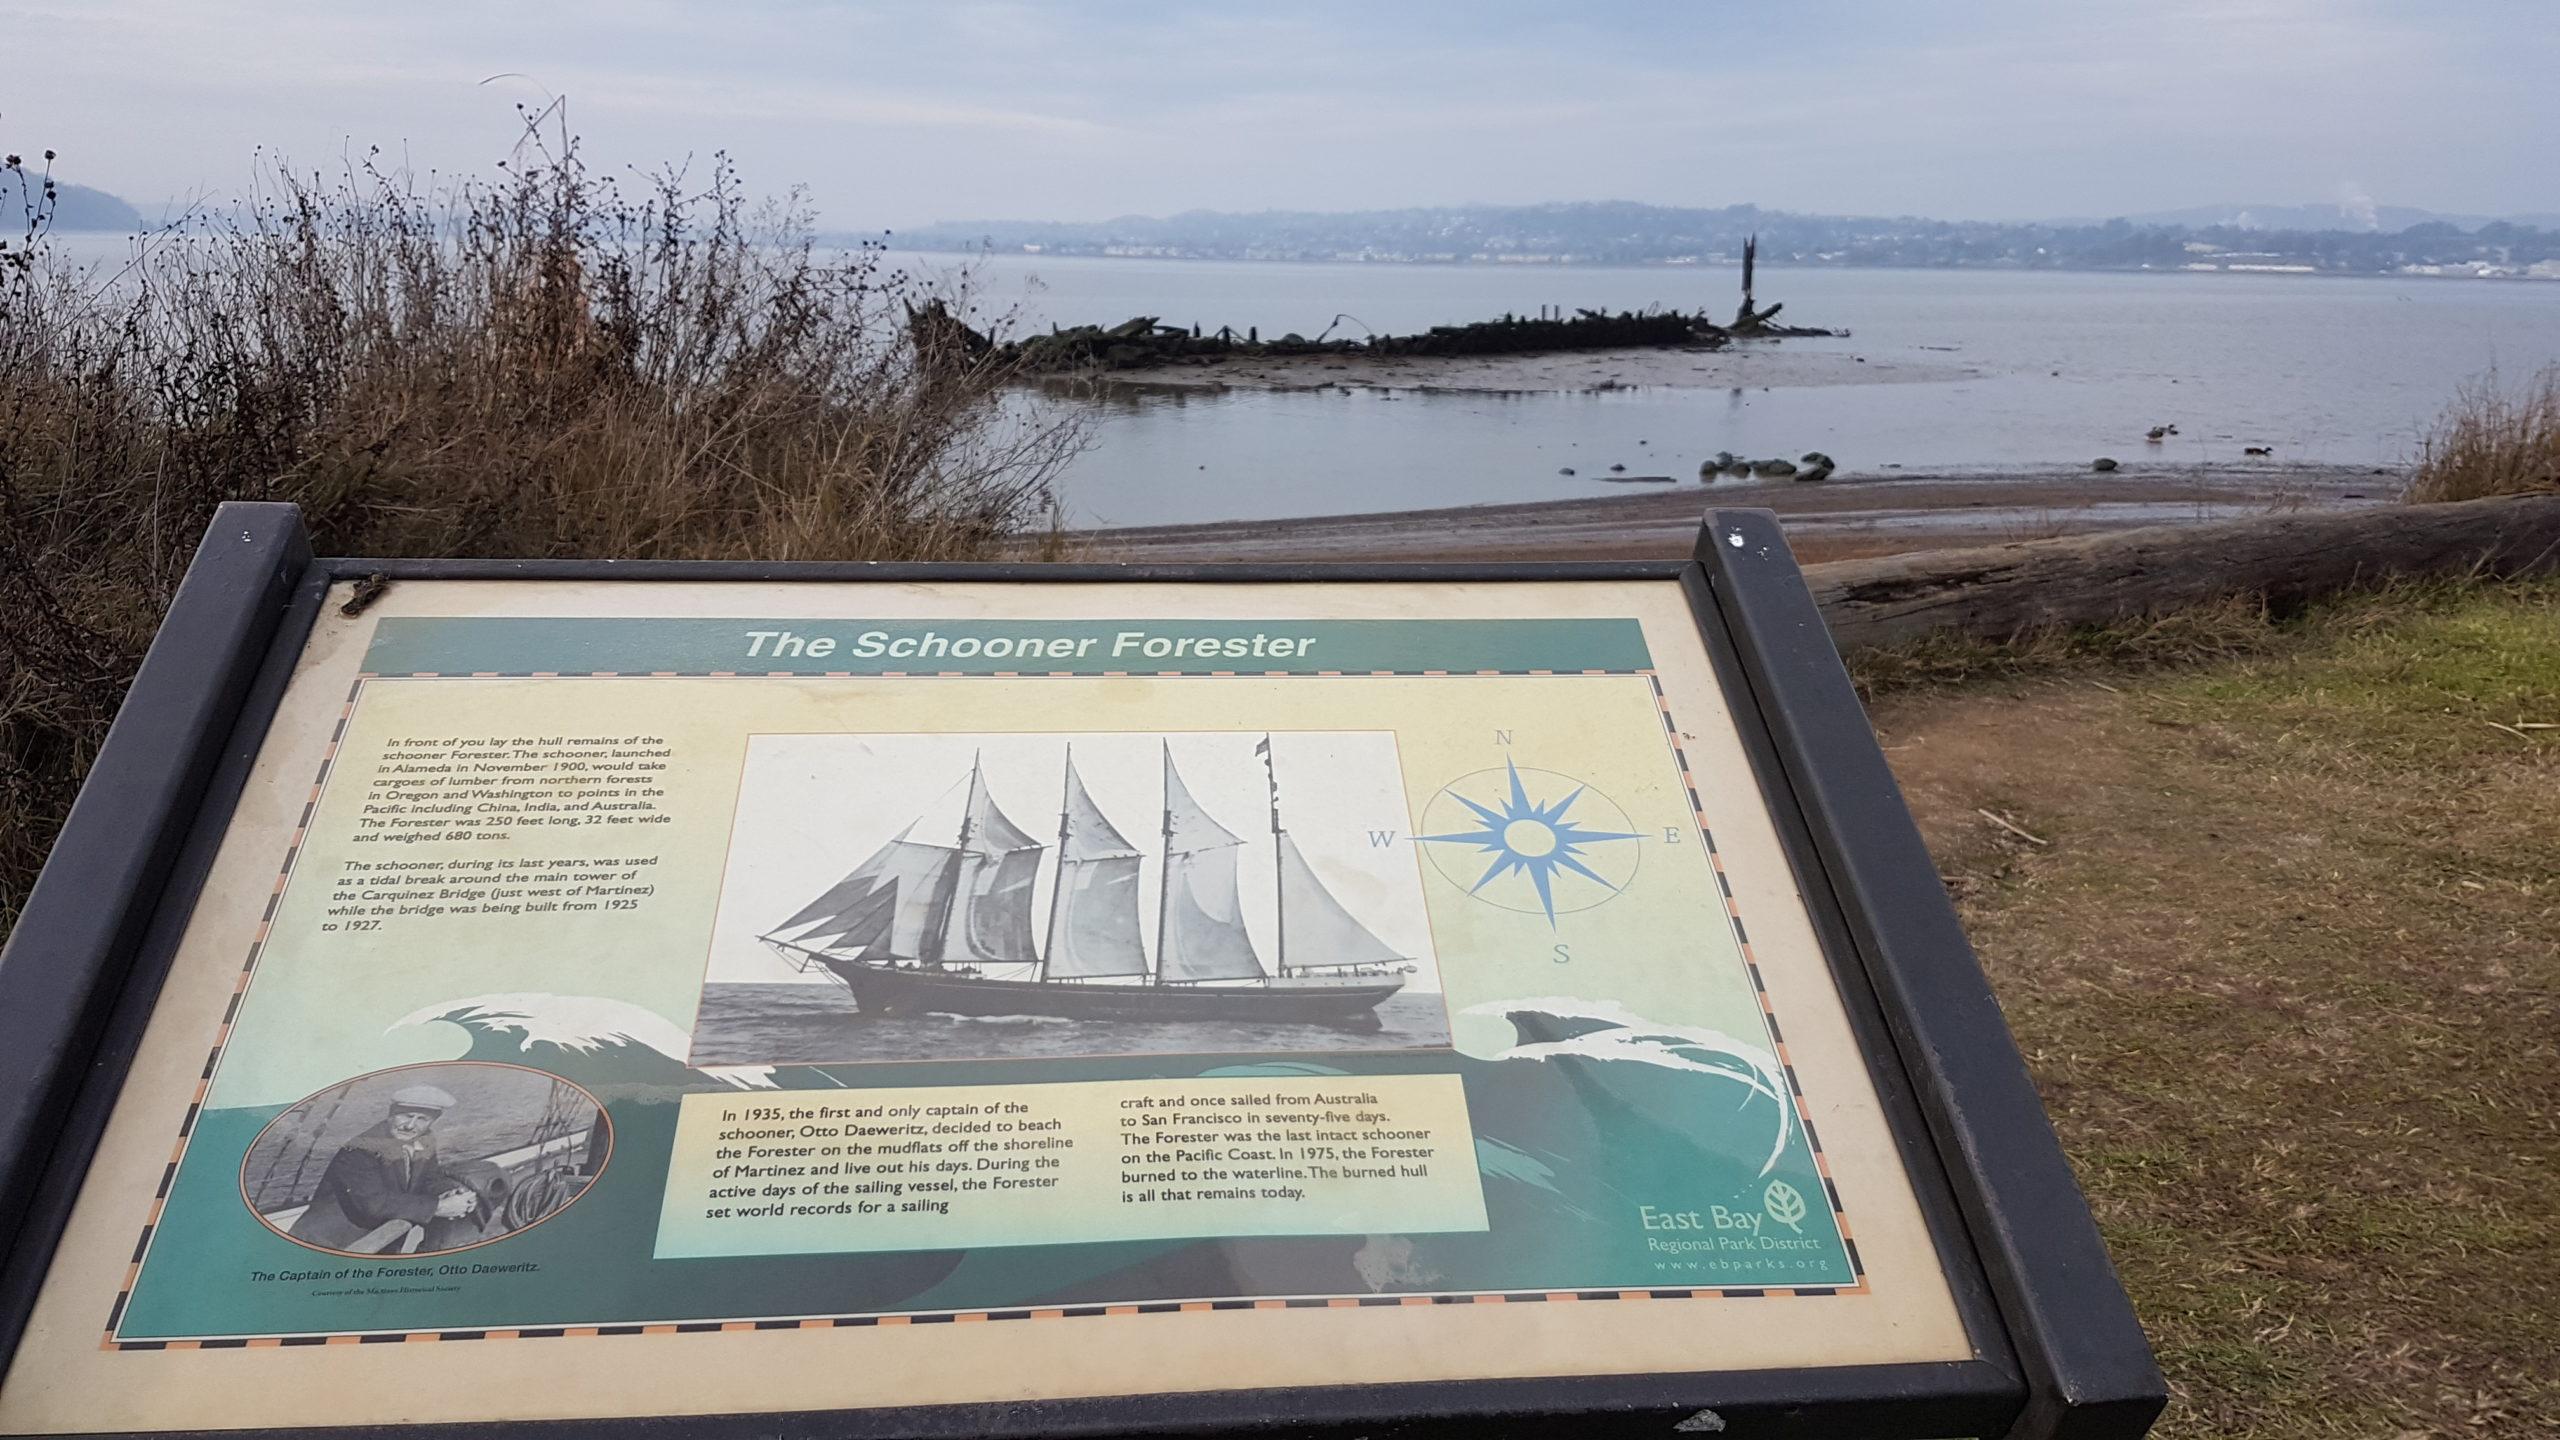 the schooner forester in martinez california